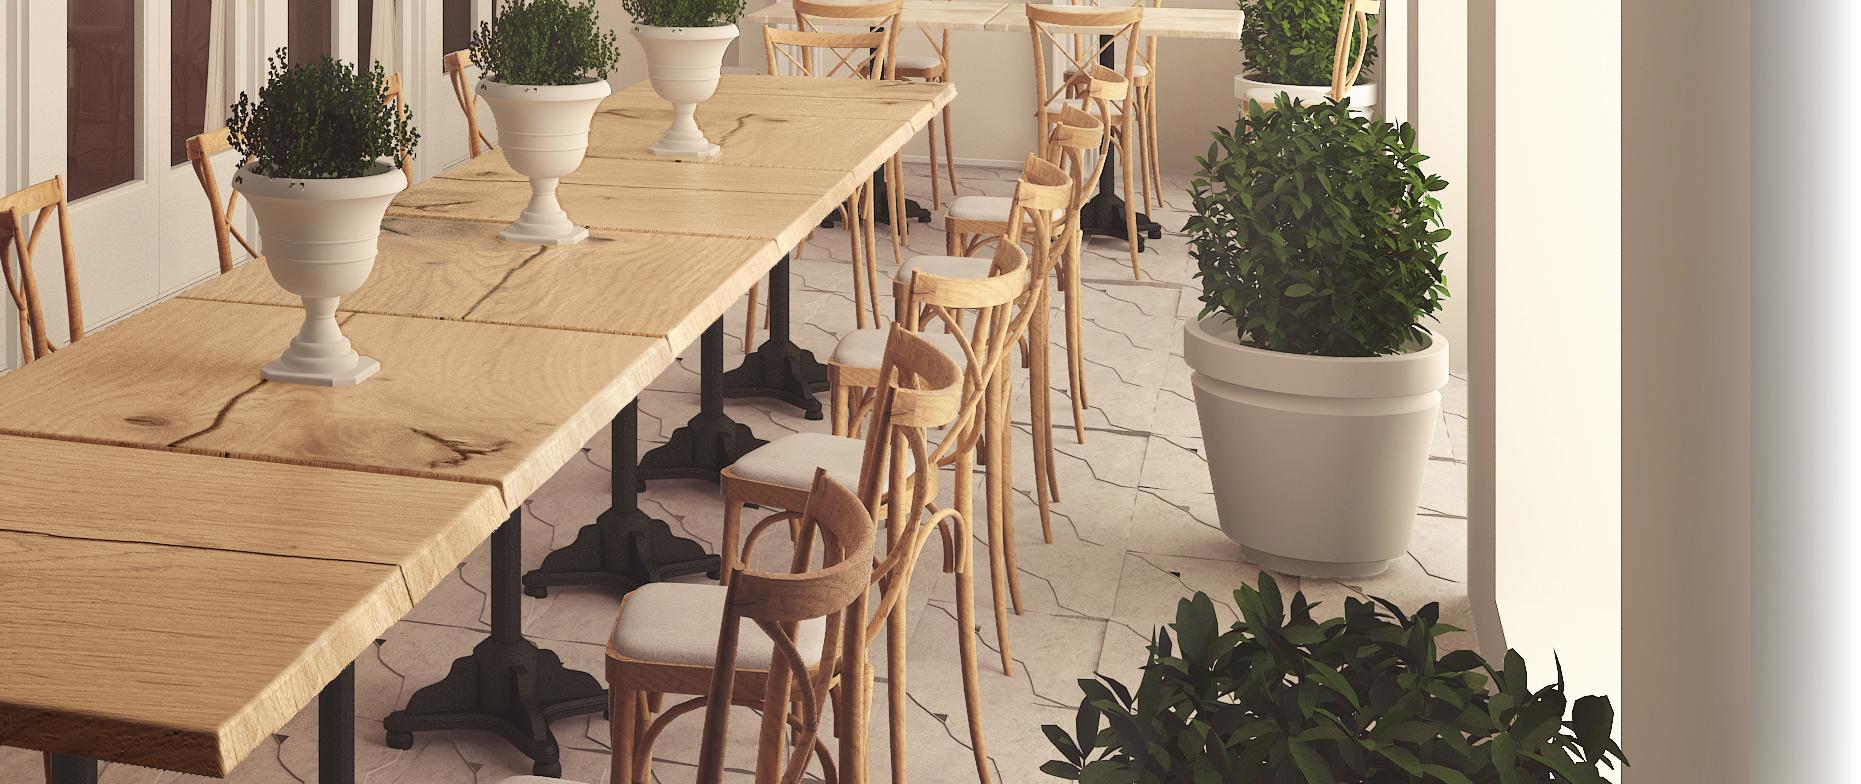 Outdoor Table Tops Commercial Grade Bar Set